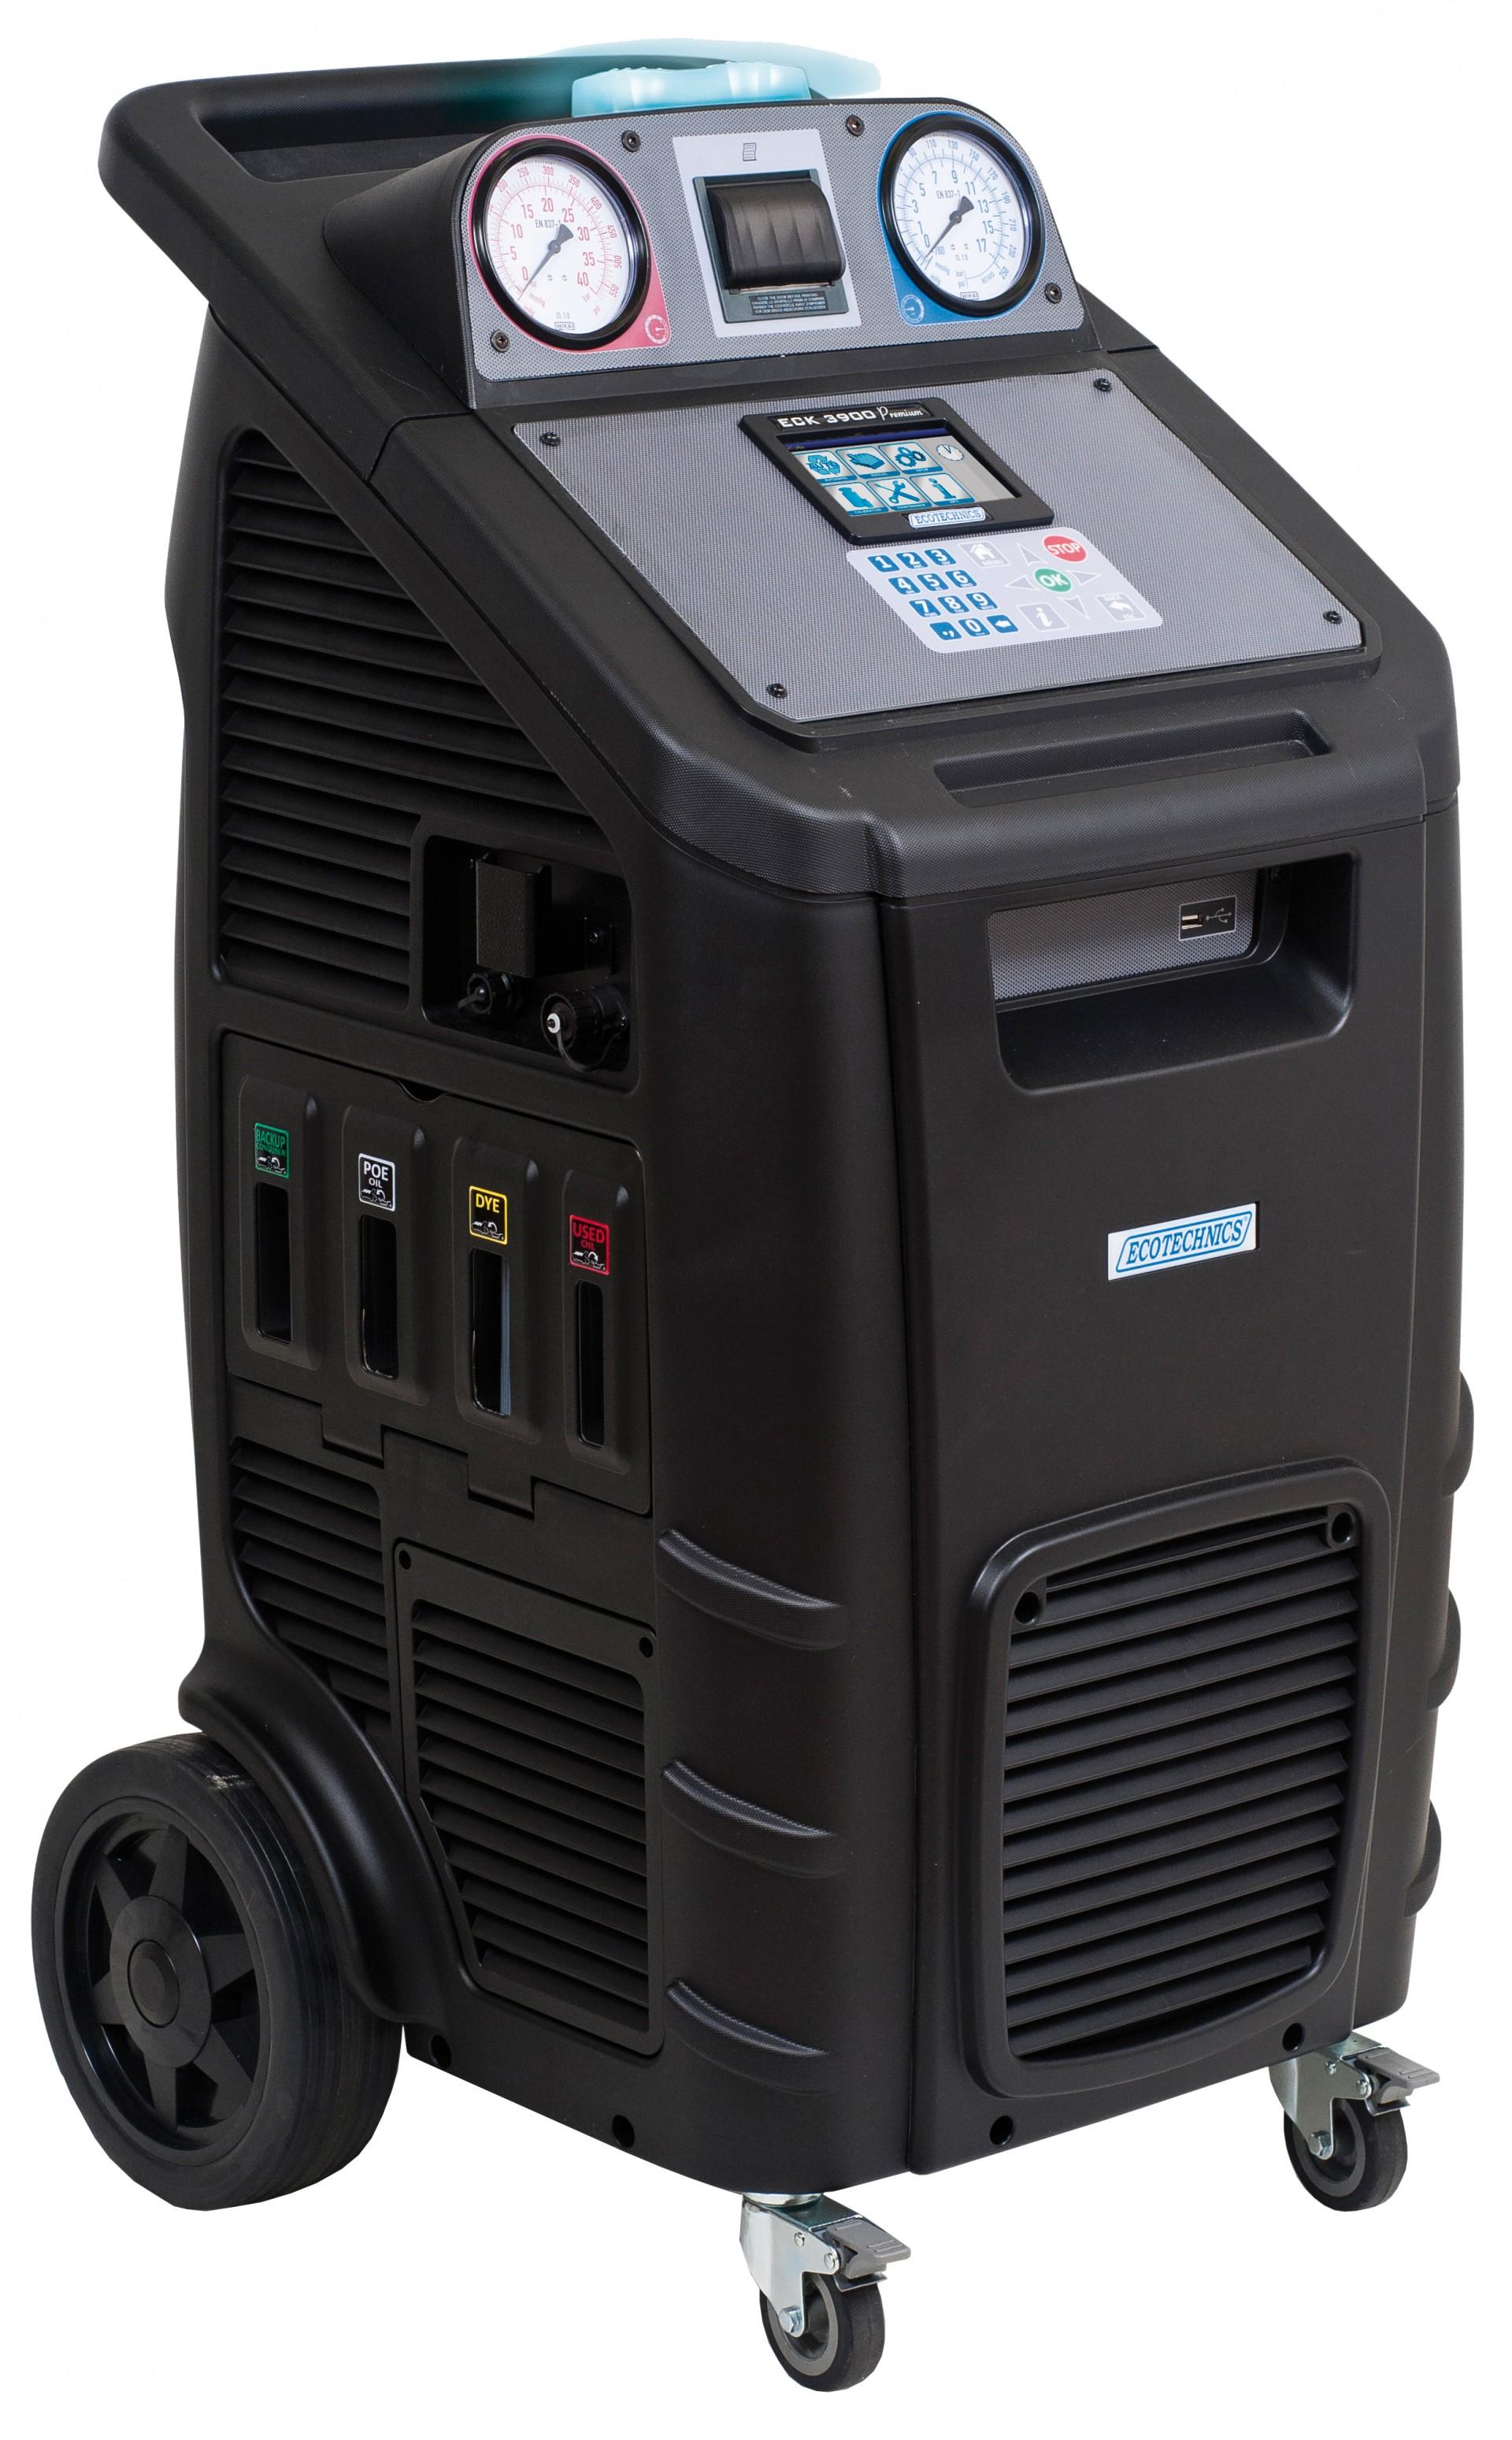 Ecotechnics ECK3900P